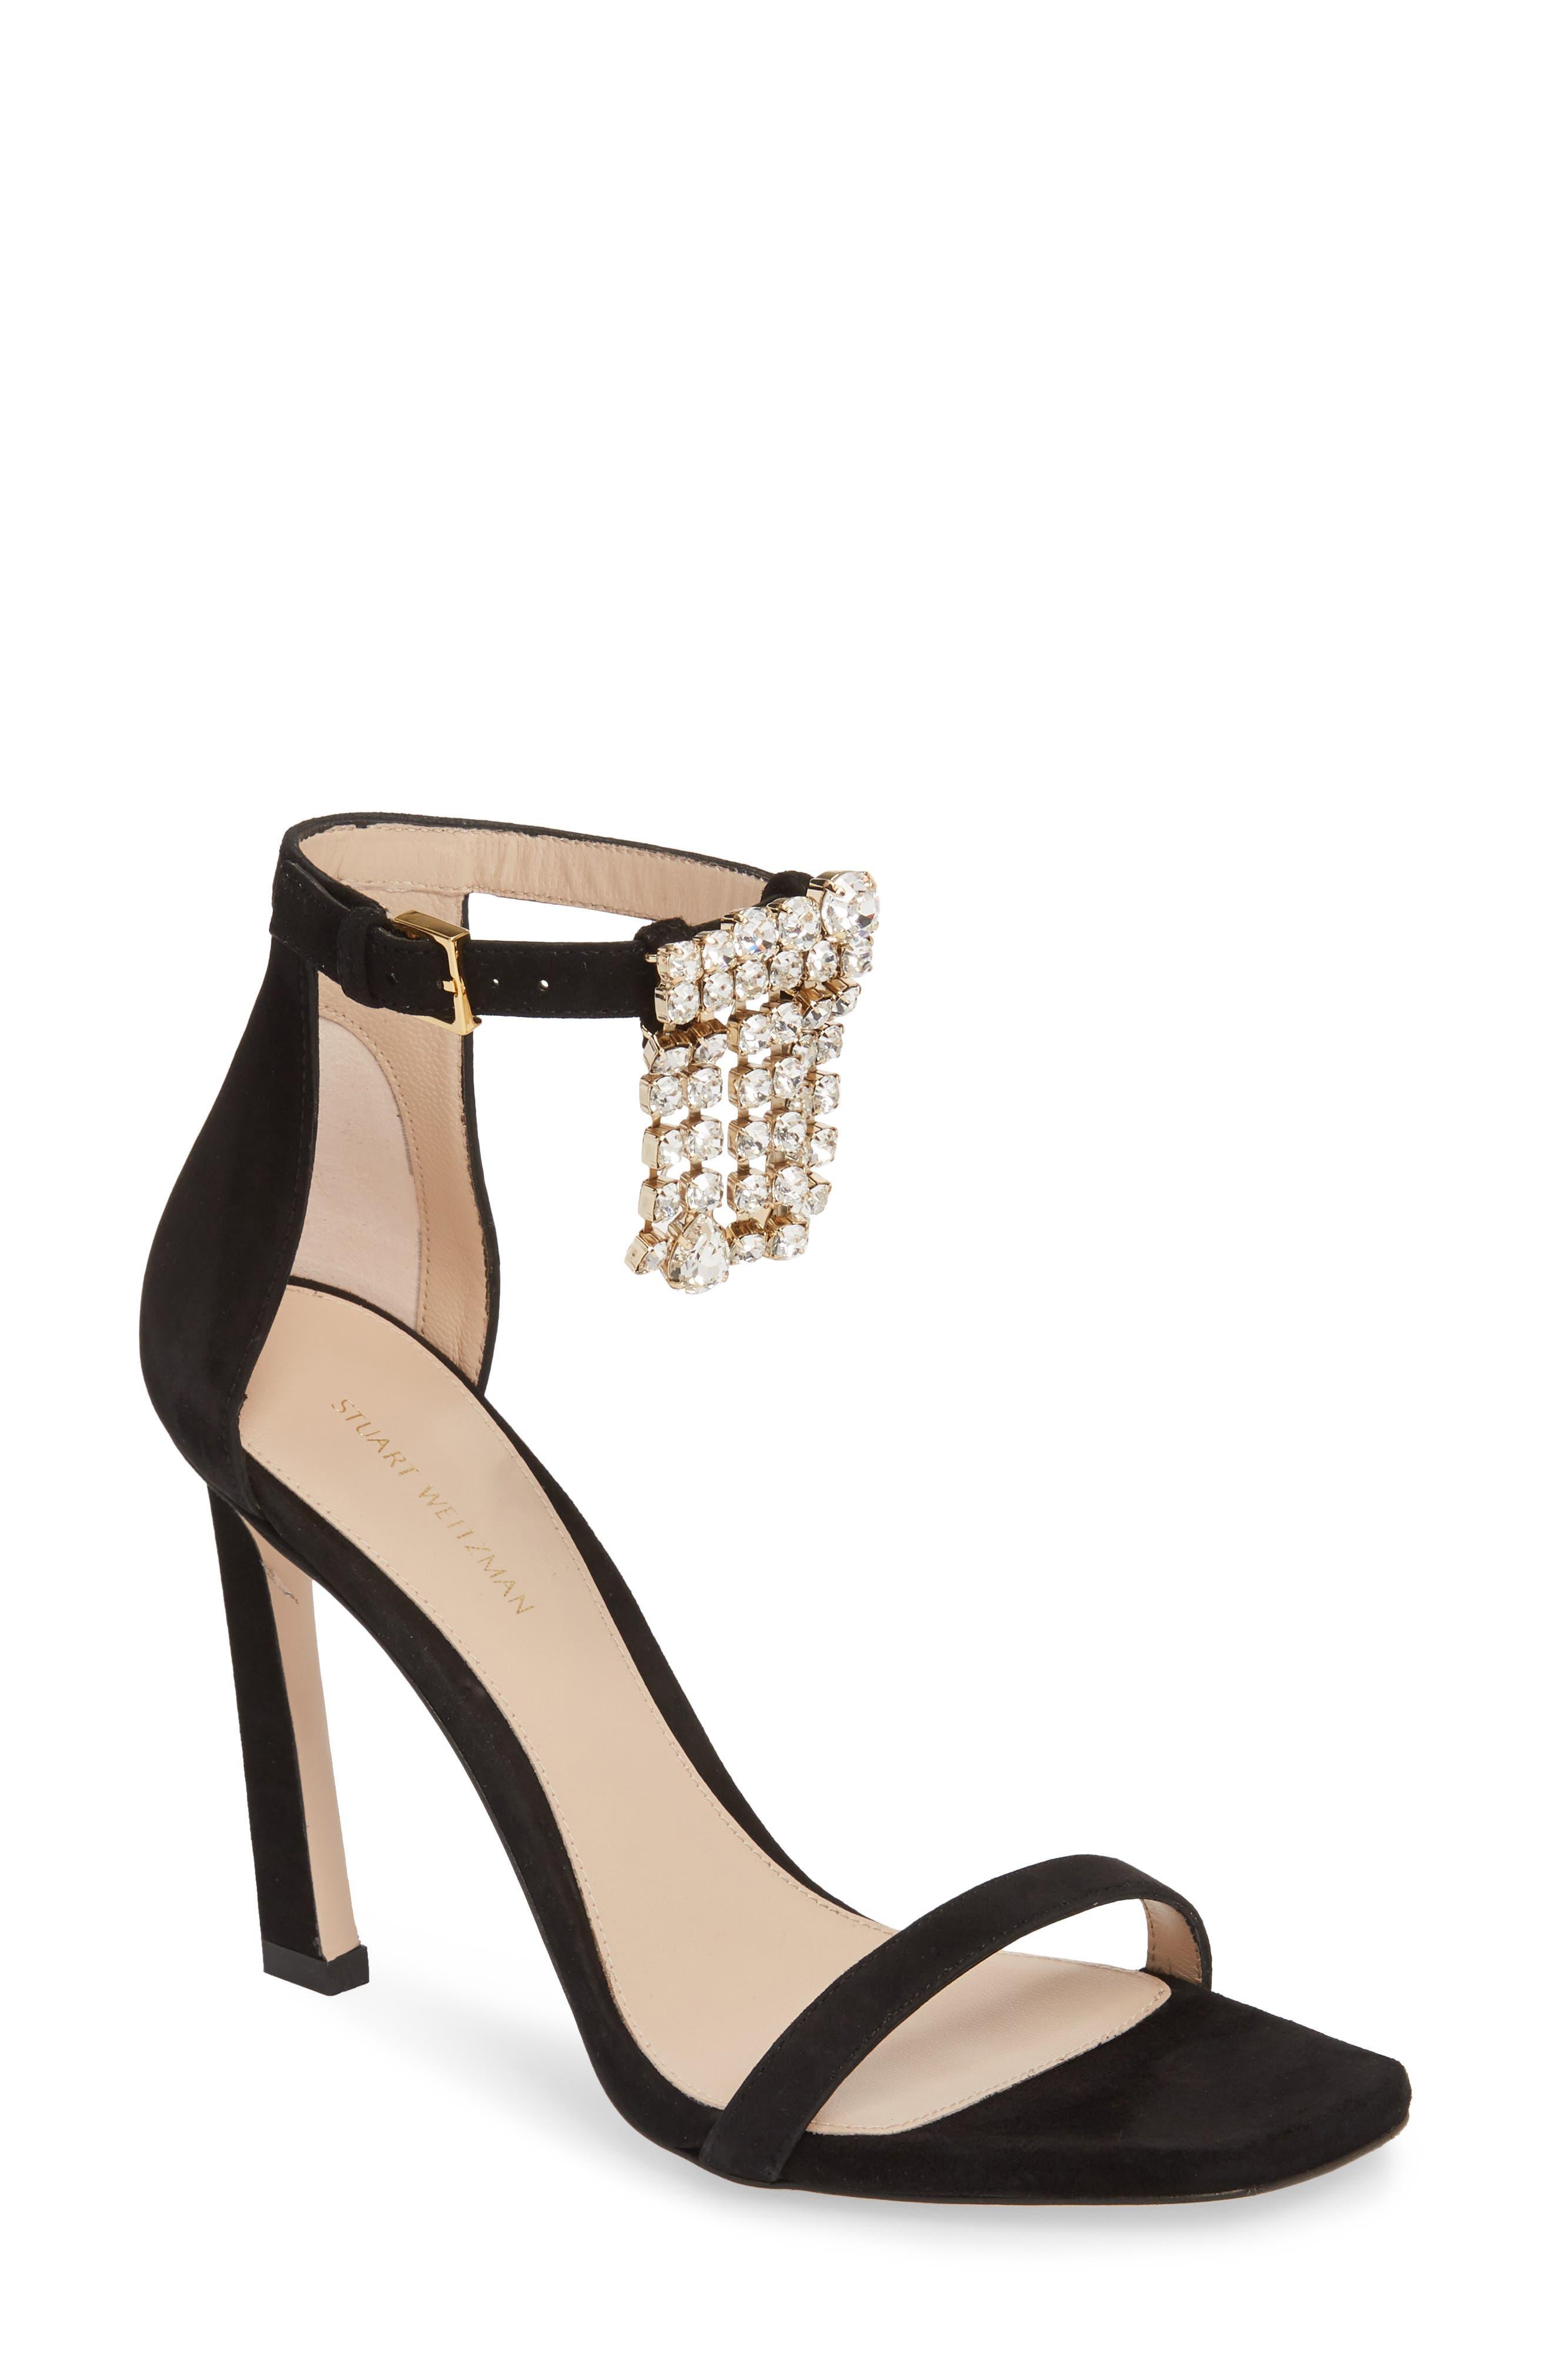 100FRINGESQUARENUDIST Sandal,                         Main,                         color,